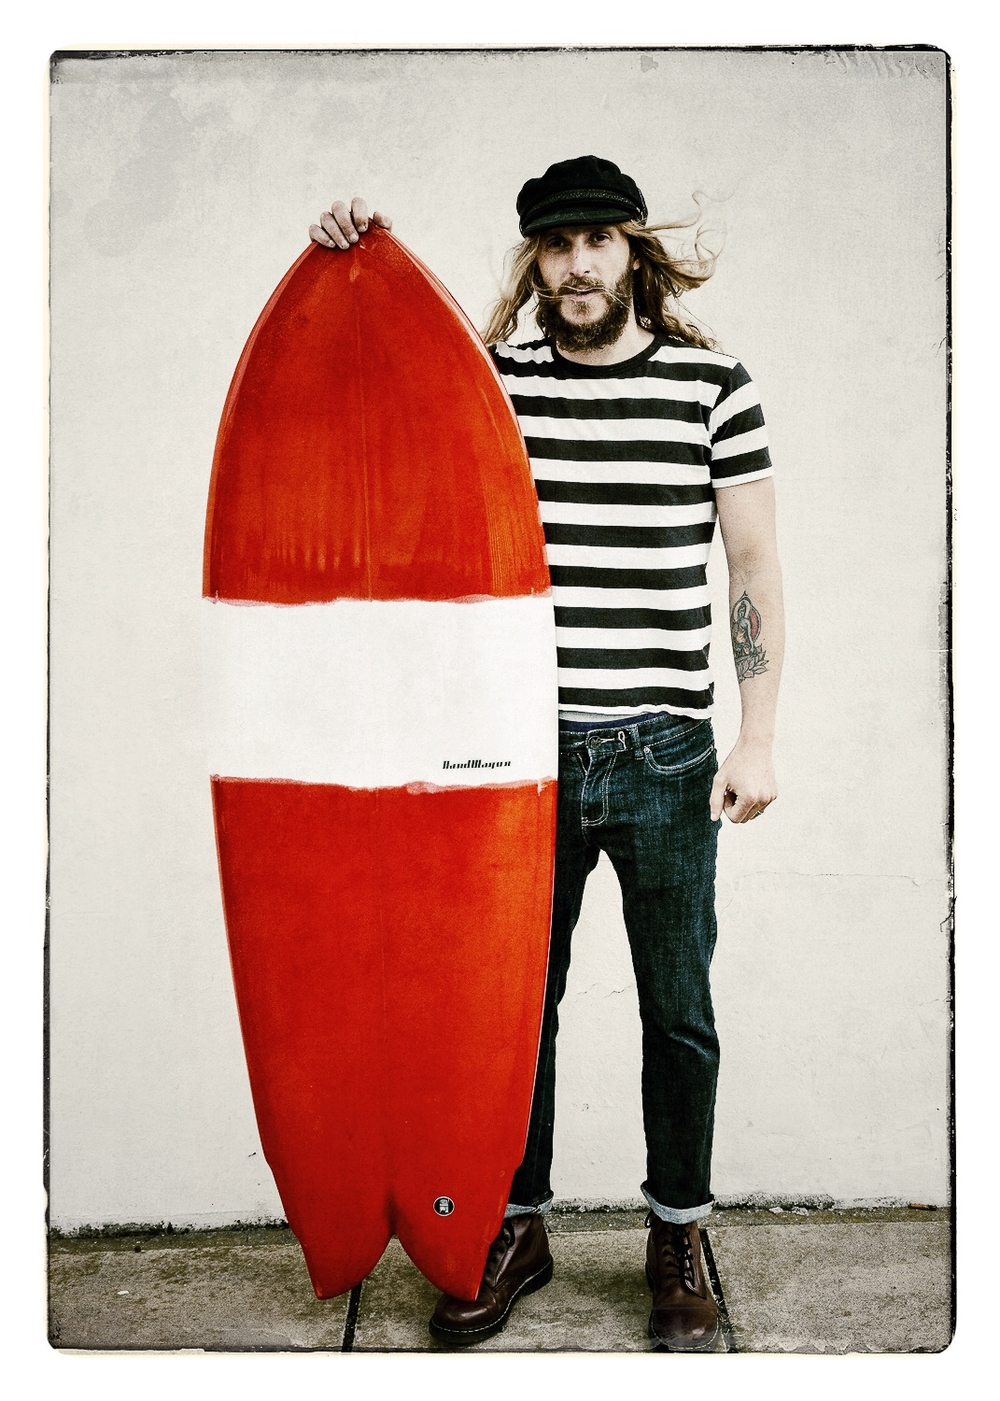 Chris Hartop - Surfboard shaper